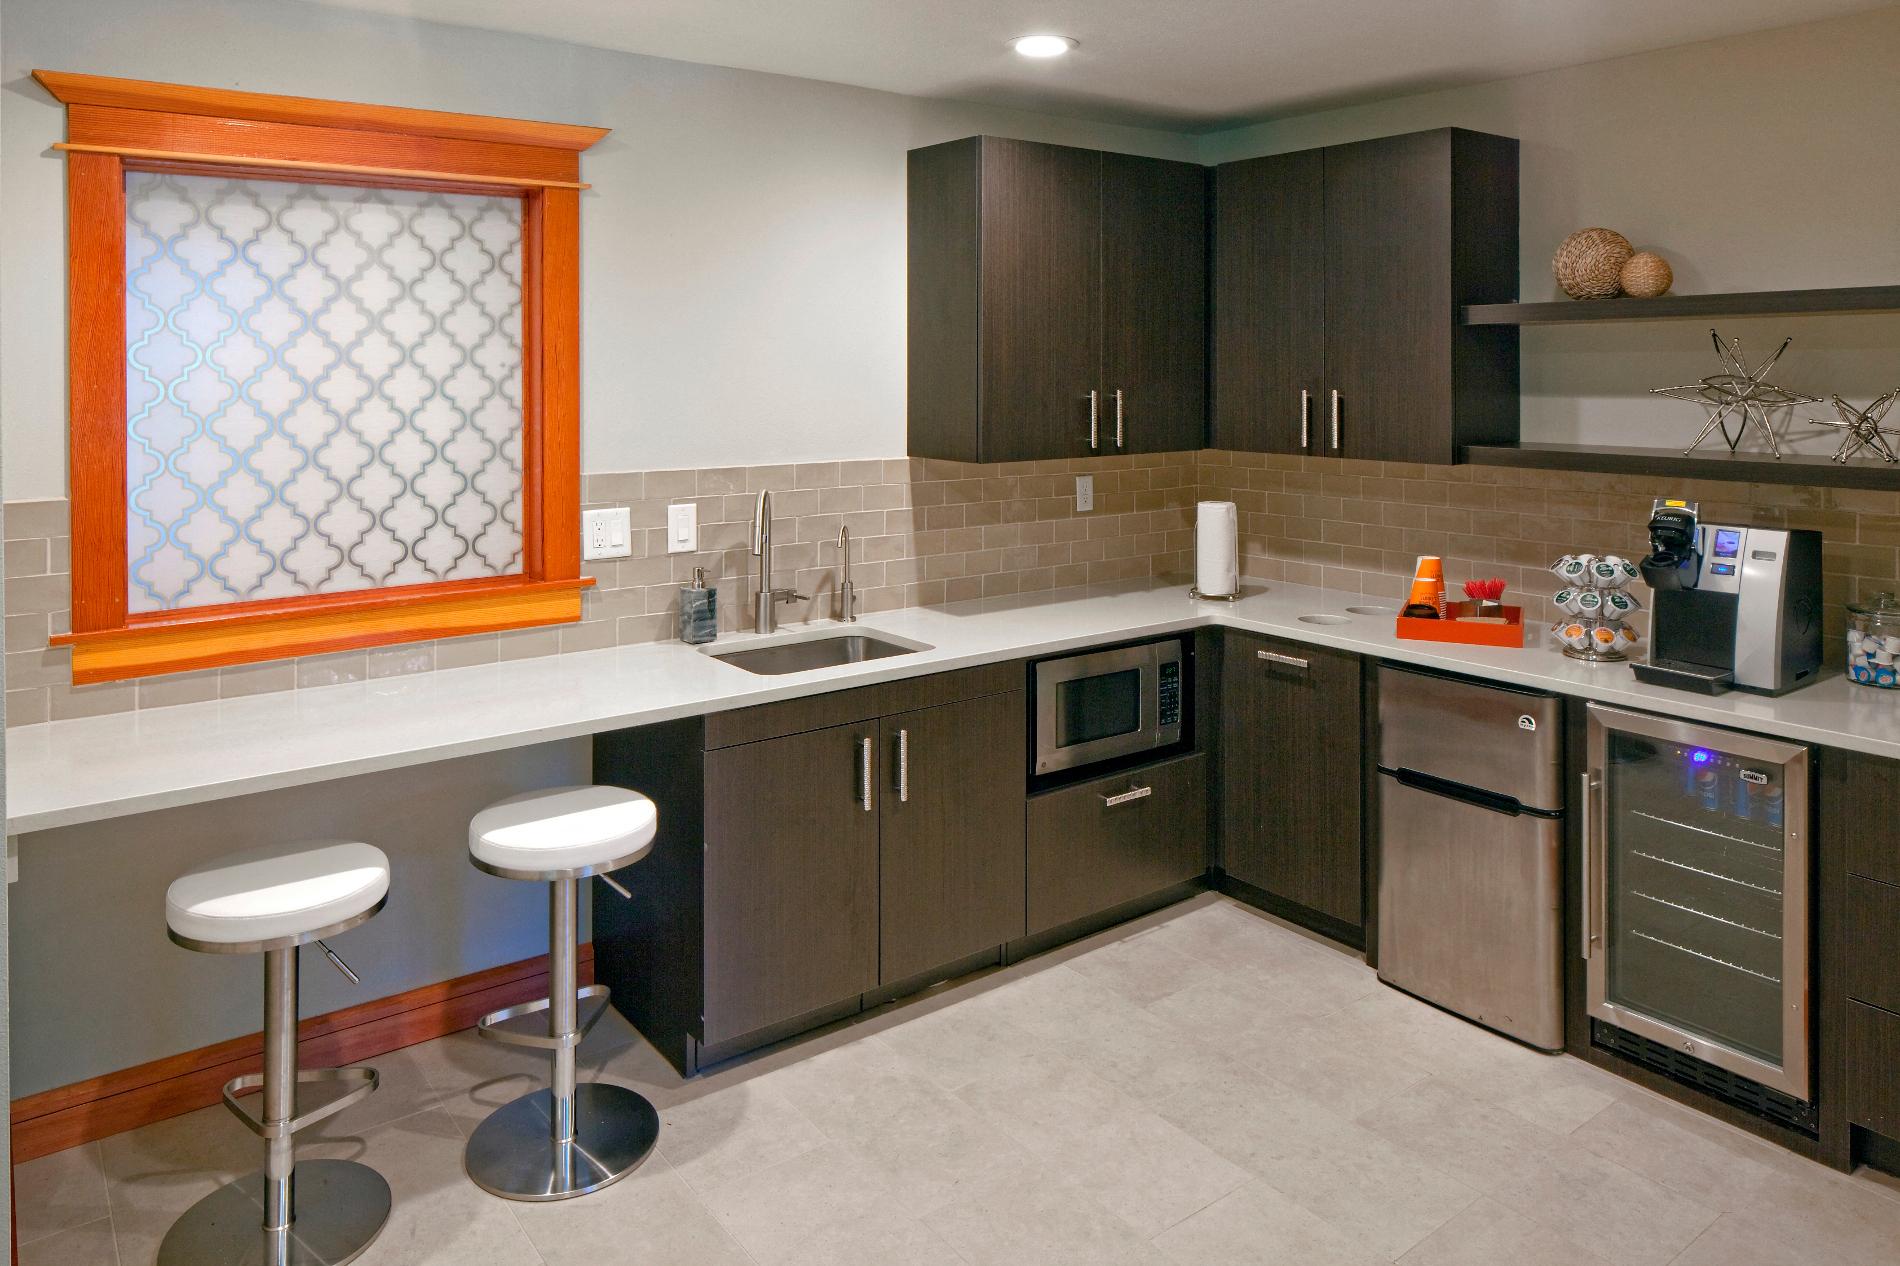 Eat-In Kitchens at Garden Park, Portland, OR 97202